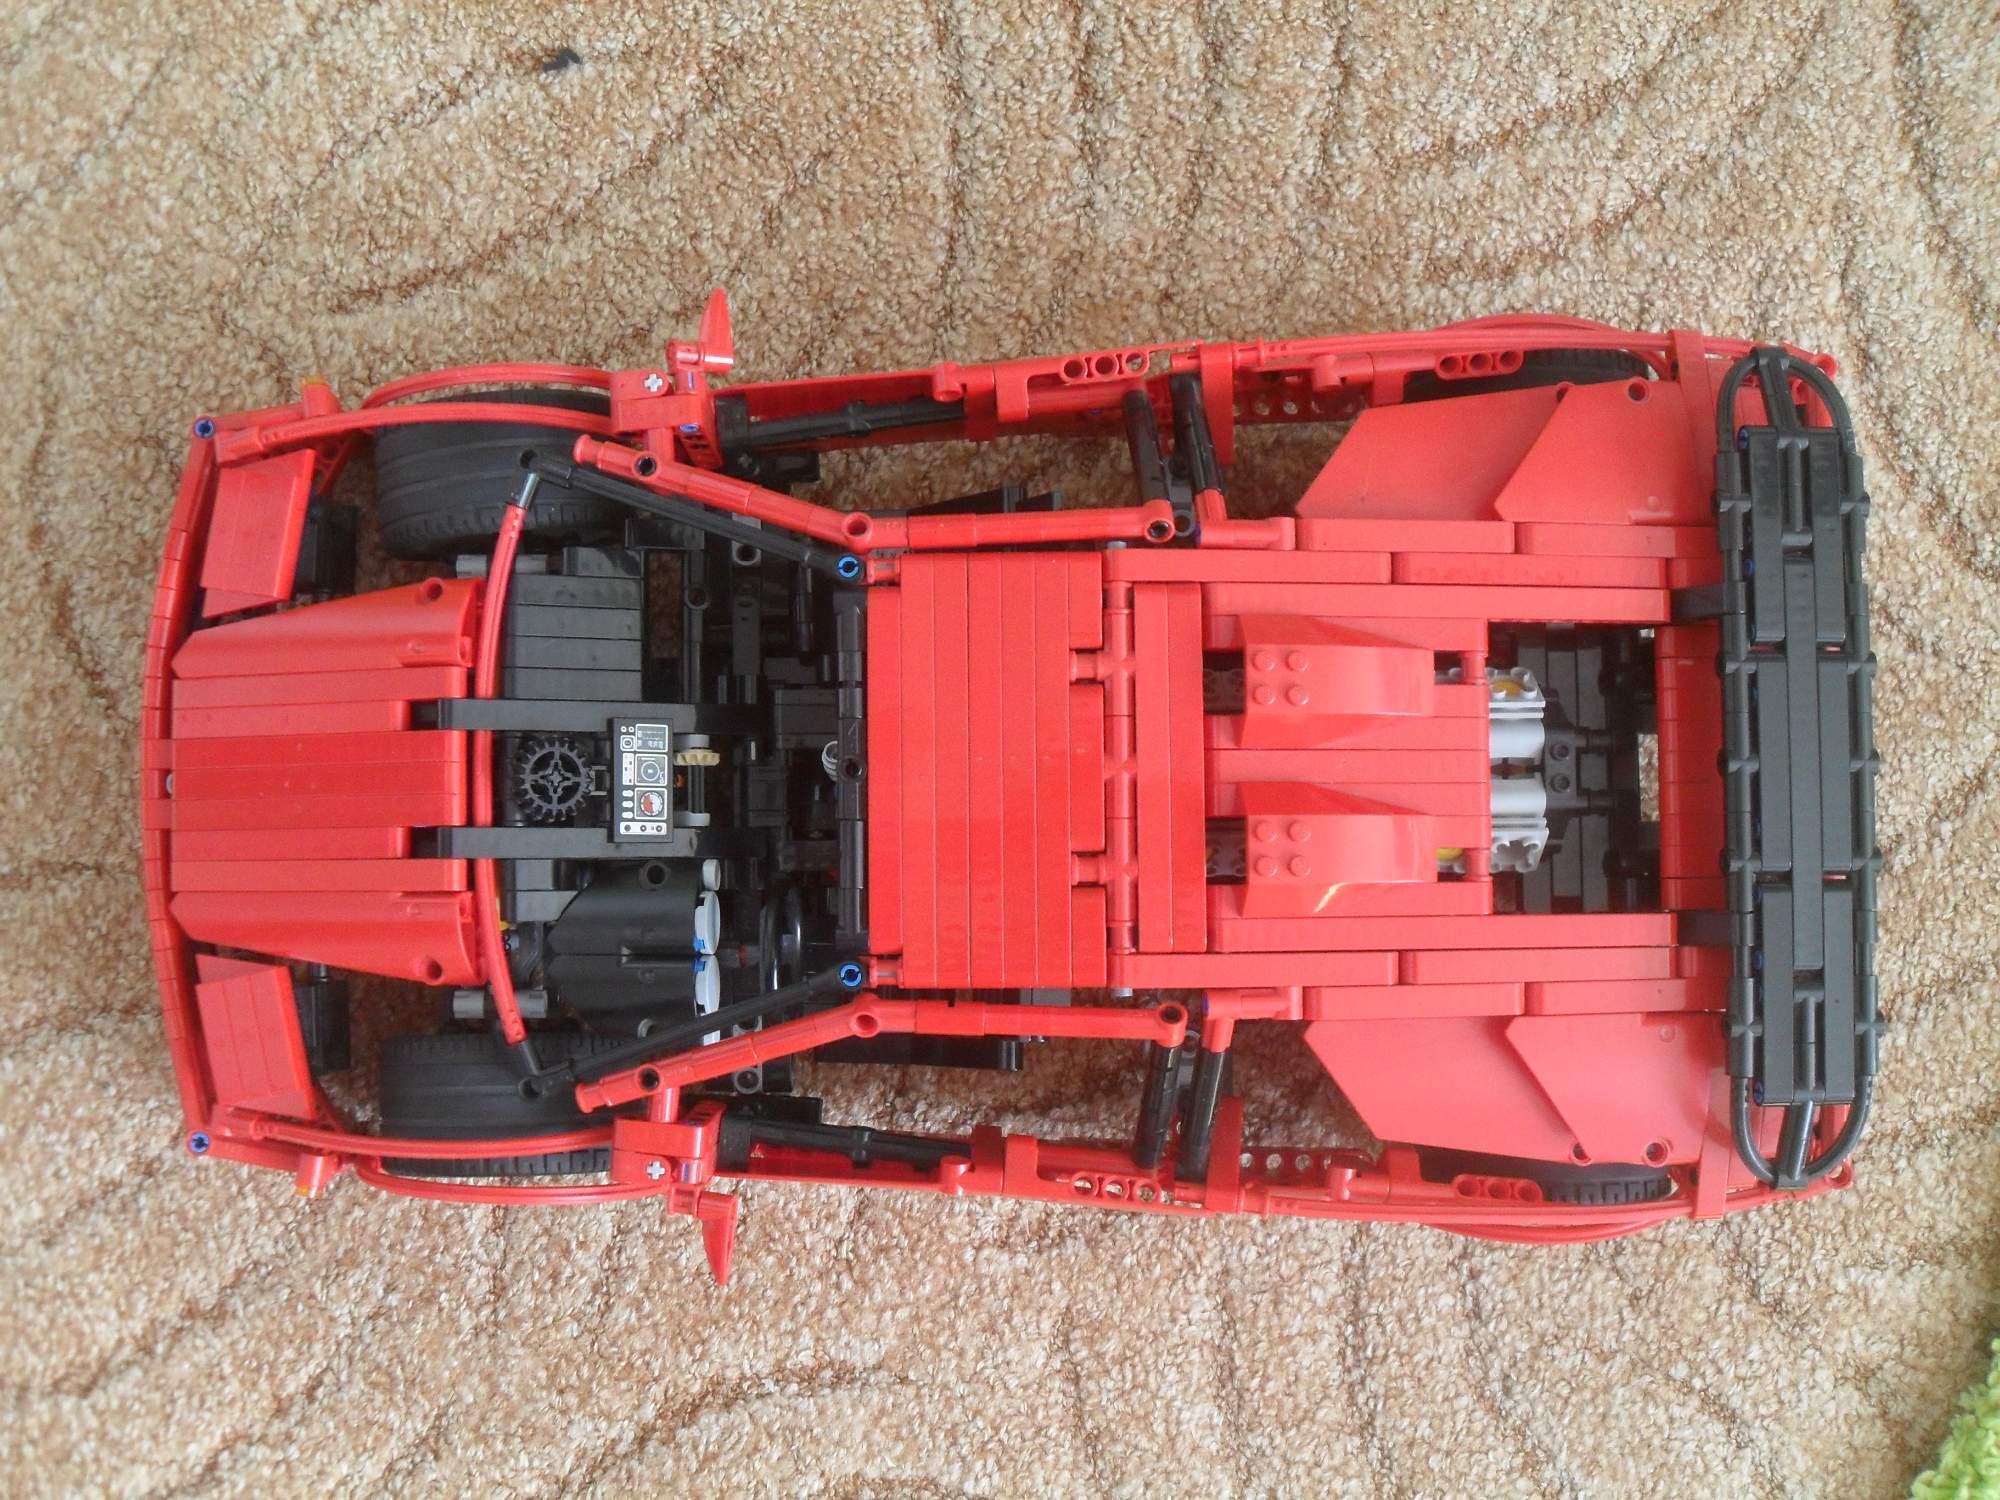 Lamborghini Diablo Sv A Lego 174 Creation By Tomas Lambo